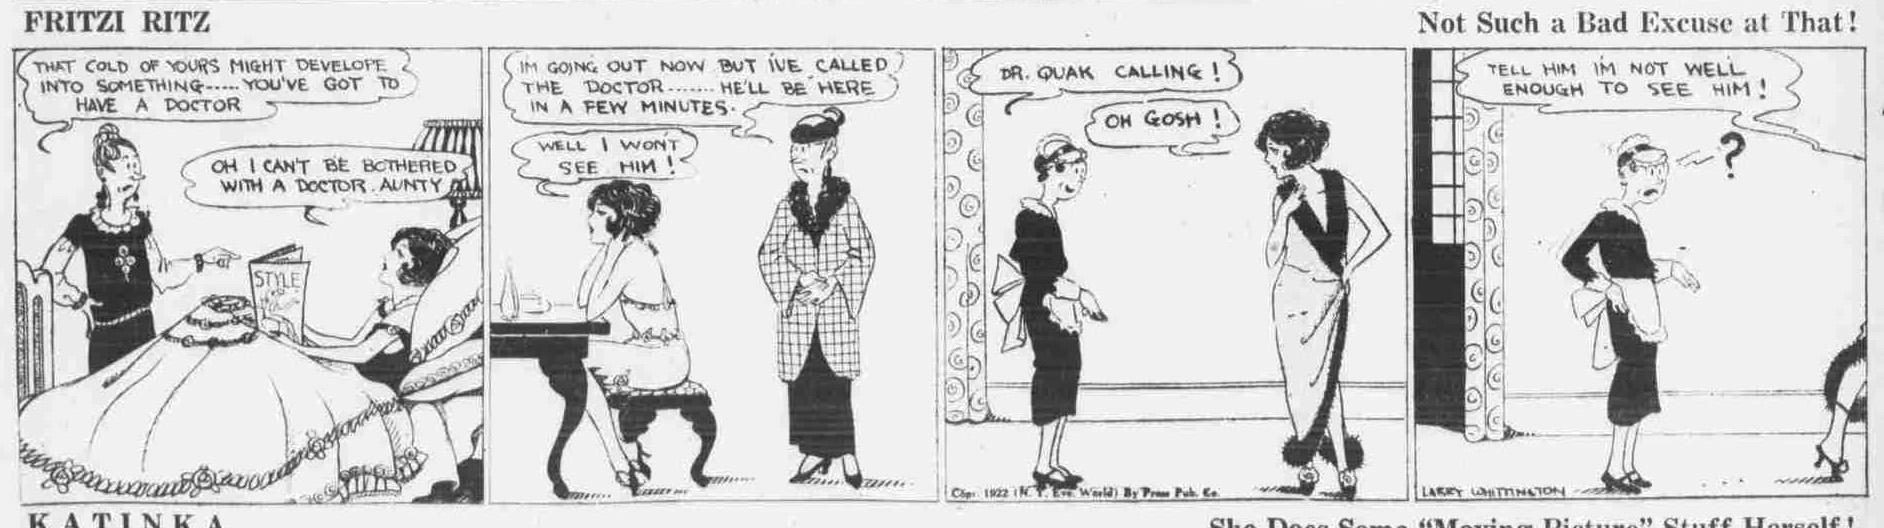 Nov. 23, 1922